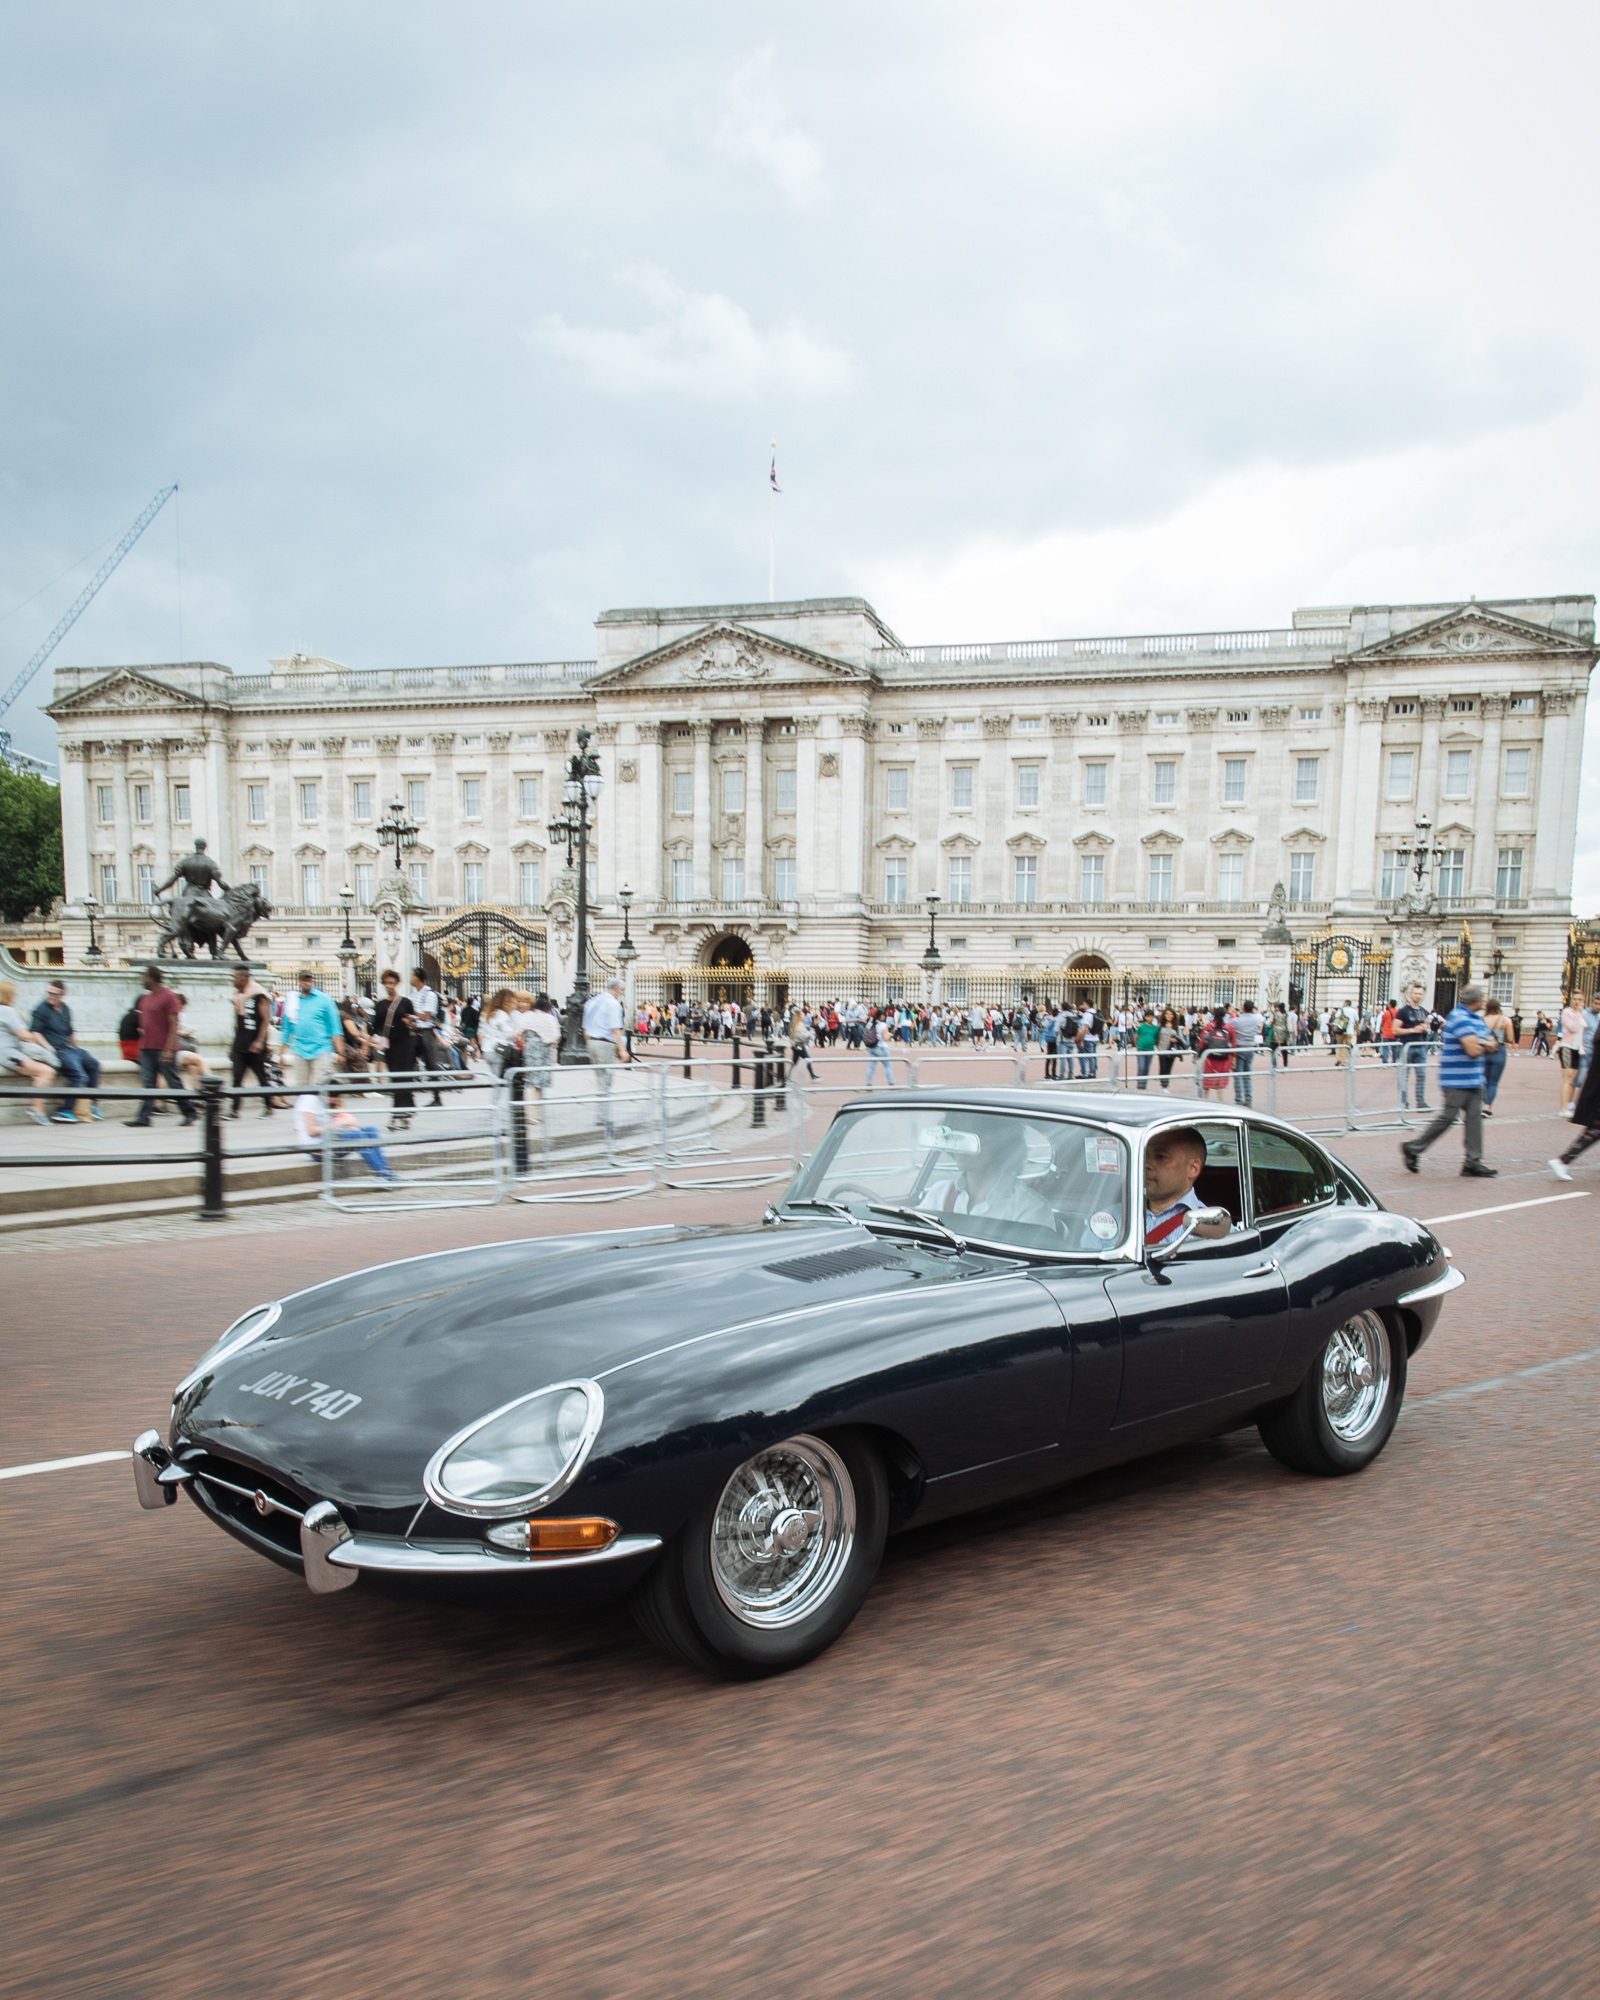 Gideon_Lang_Laddie_Gideons_Agency_Roadshow_London_Events_Photographer-42.jpg